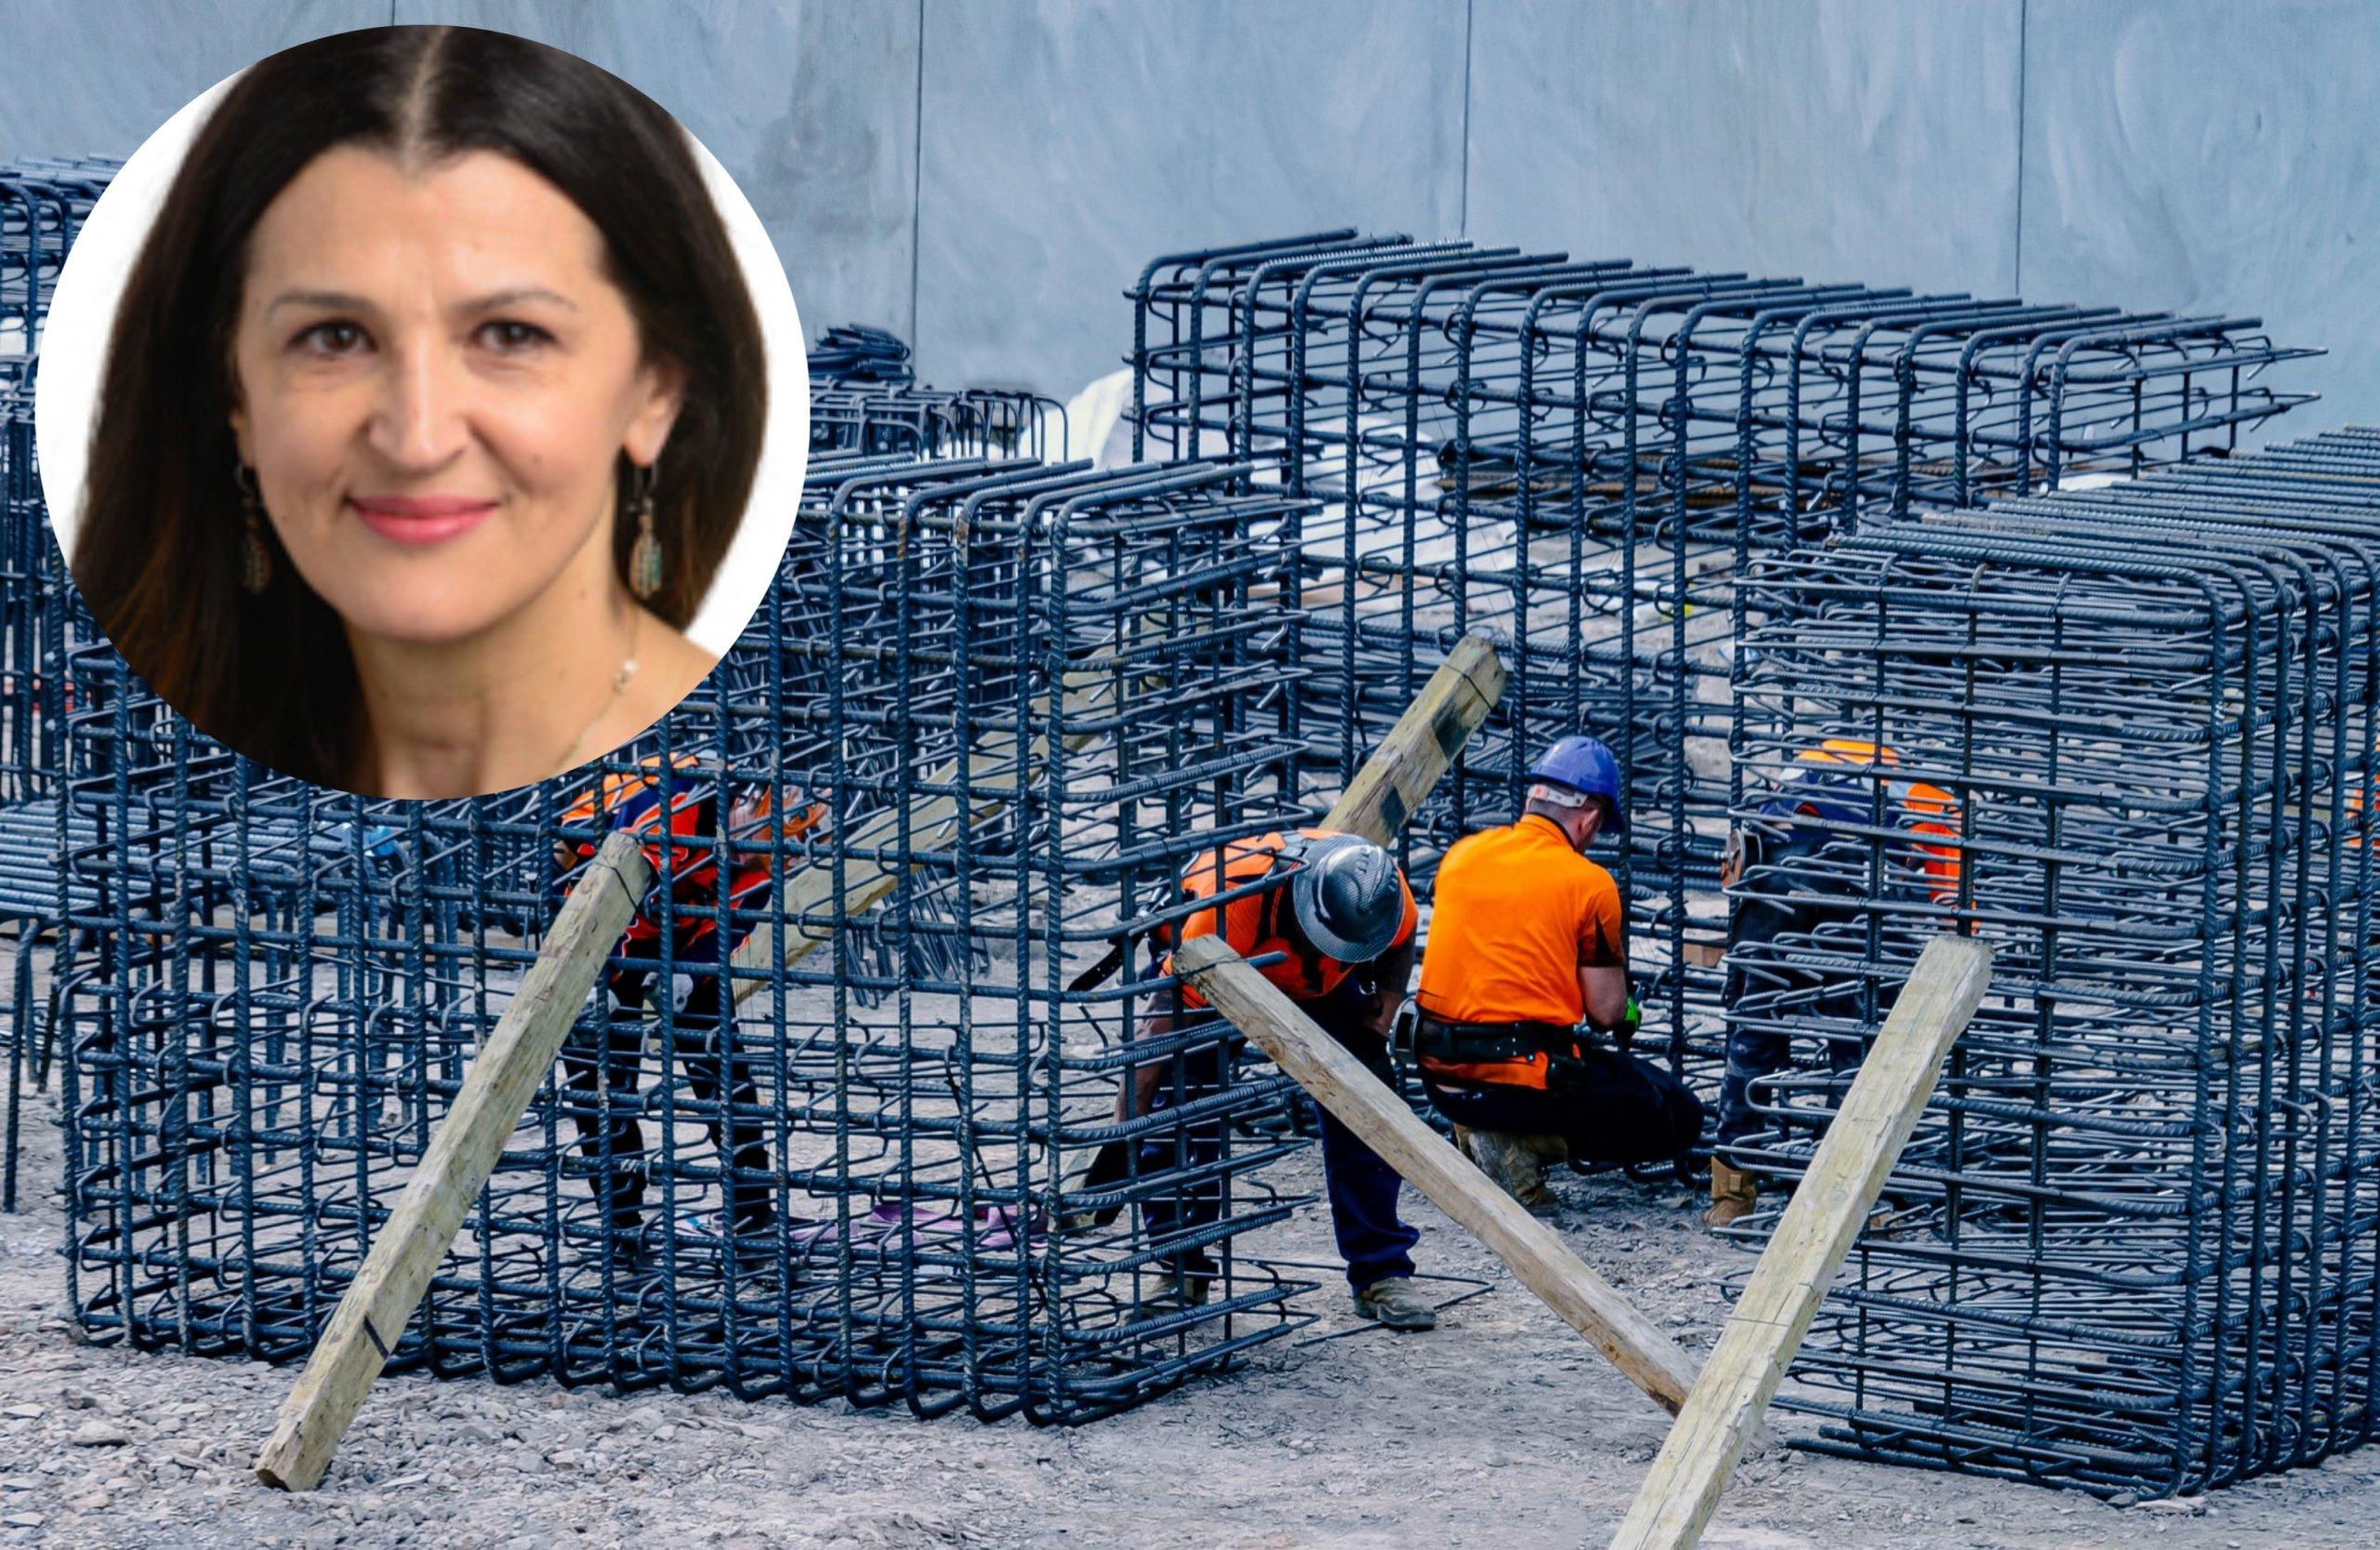 Broj izdanih građevinskih dozvola viši za devet posto, a europarlamentarka proziva Vladu zbog sporosti